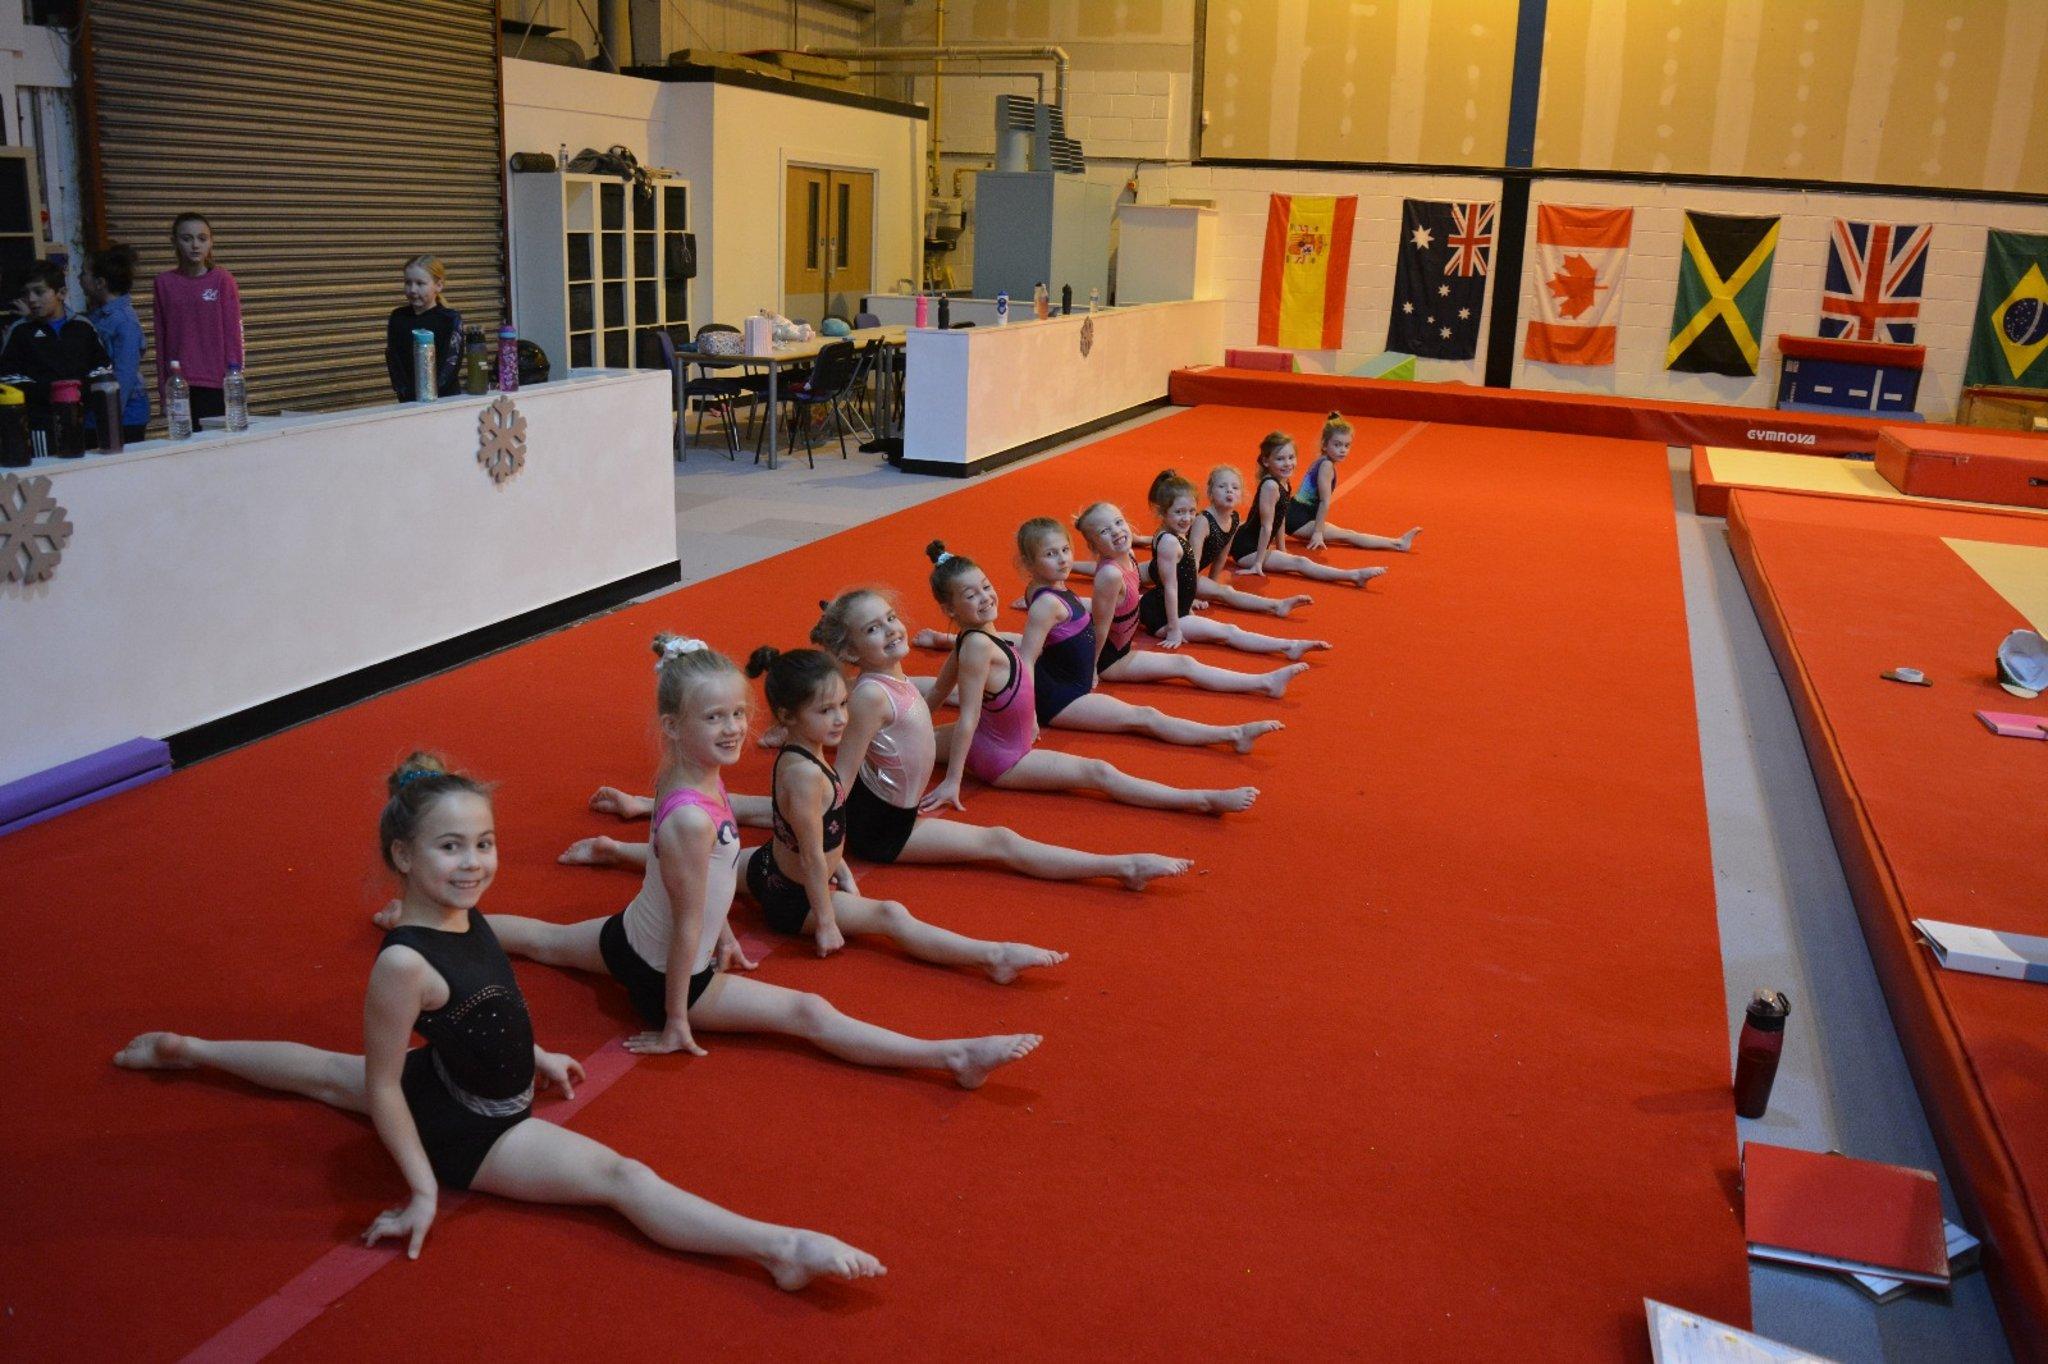 Amber Valley Gymnastics Academy - Artistic Gymnastics